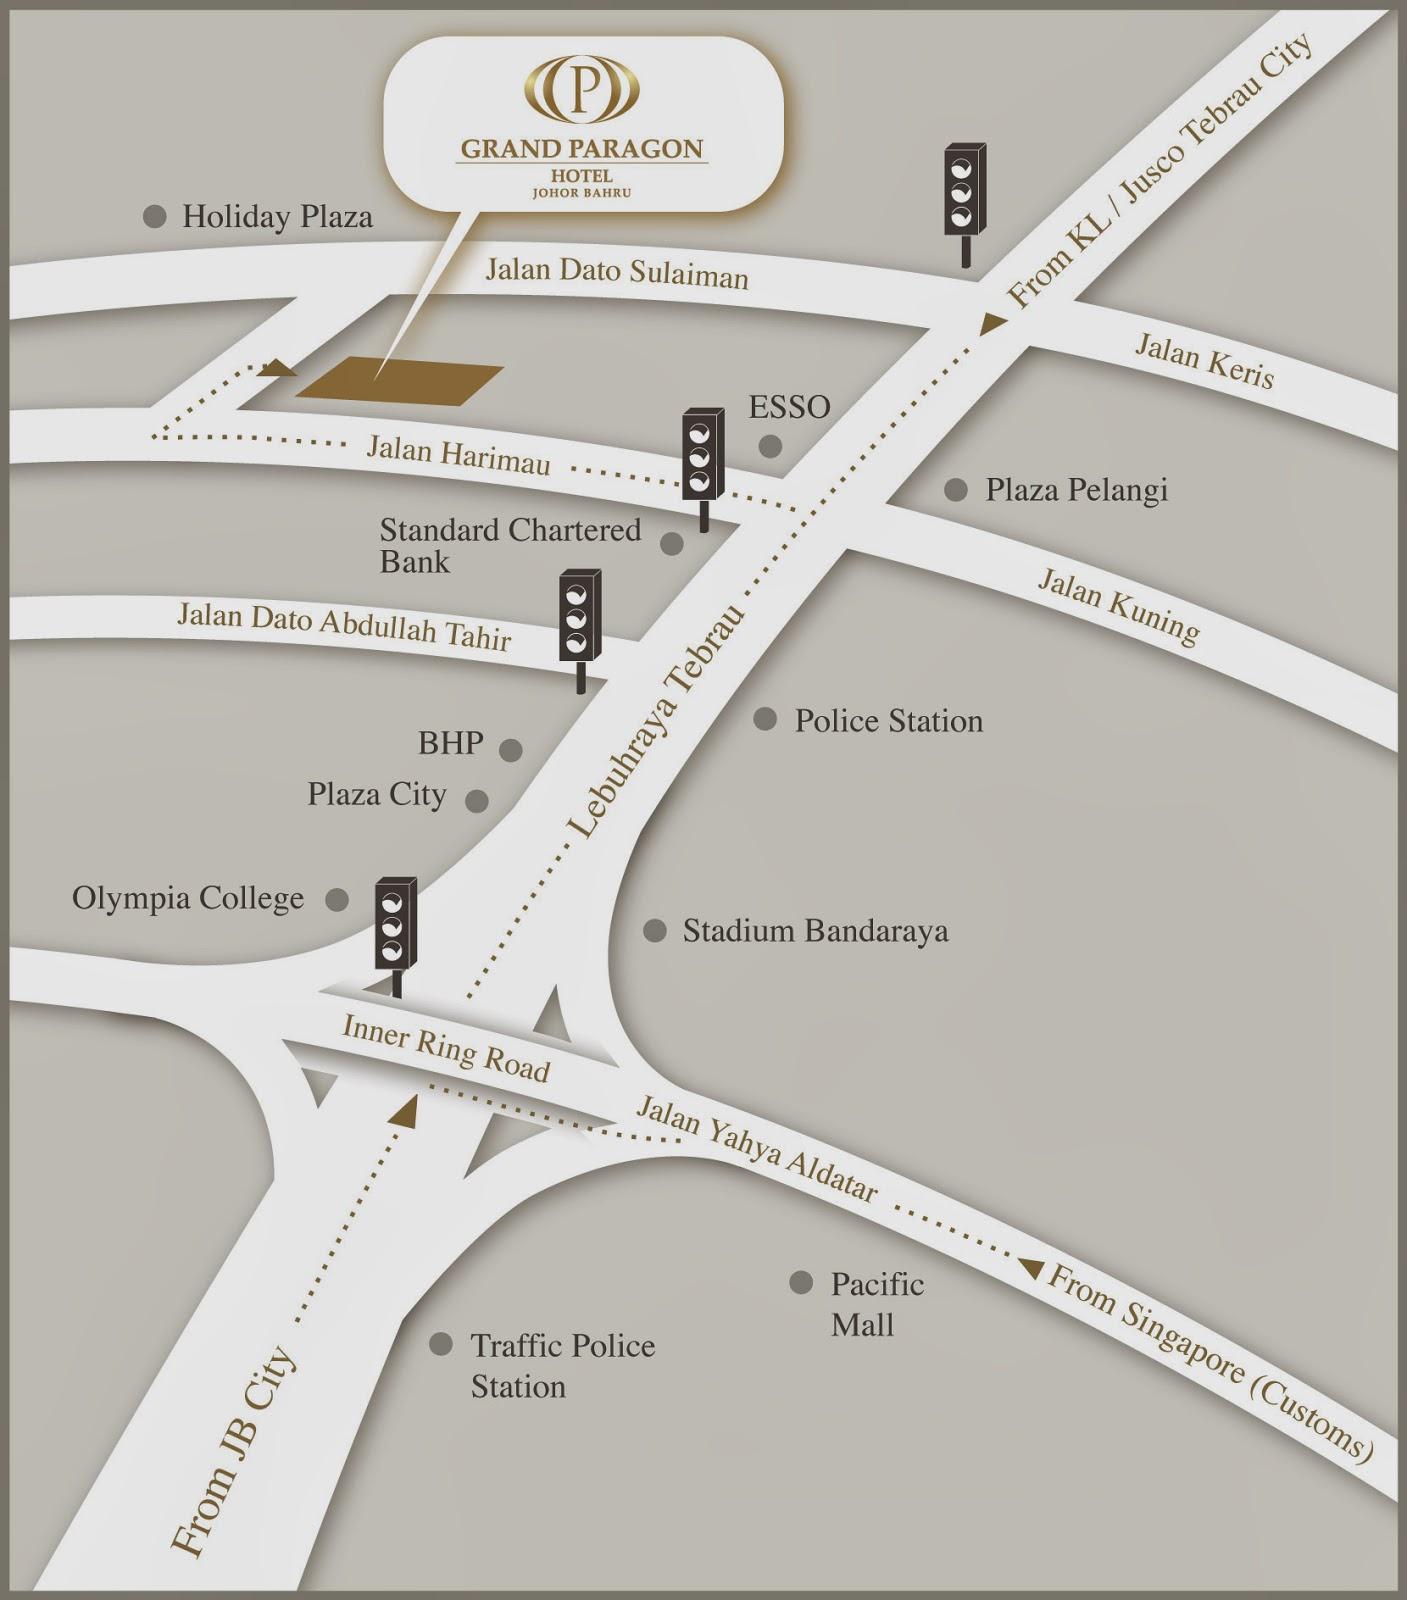 jalan kuning plaza pelangi